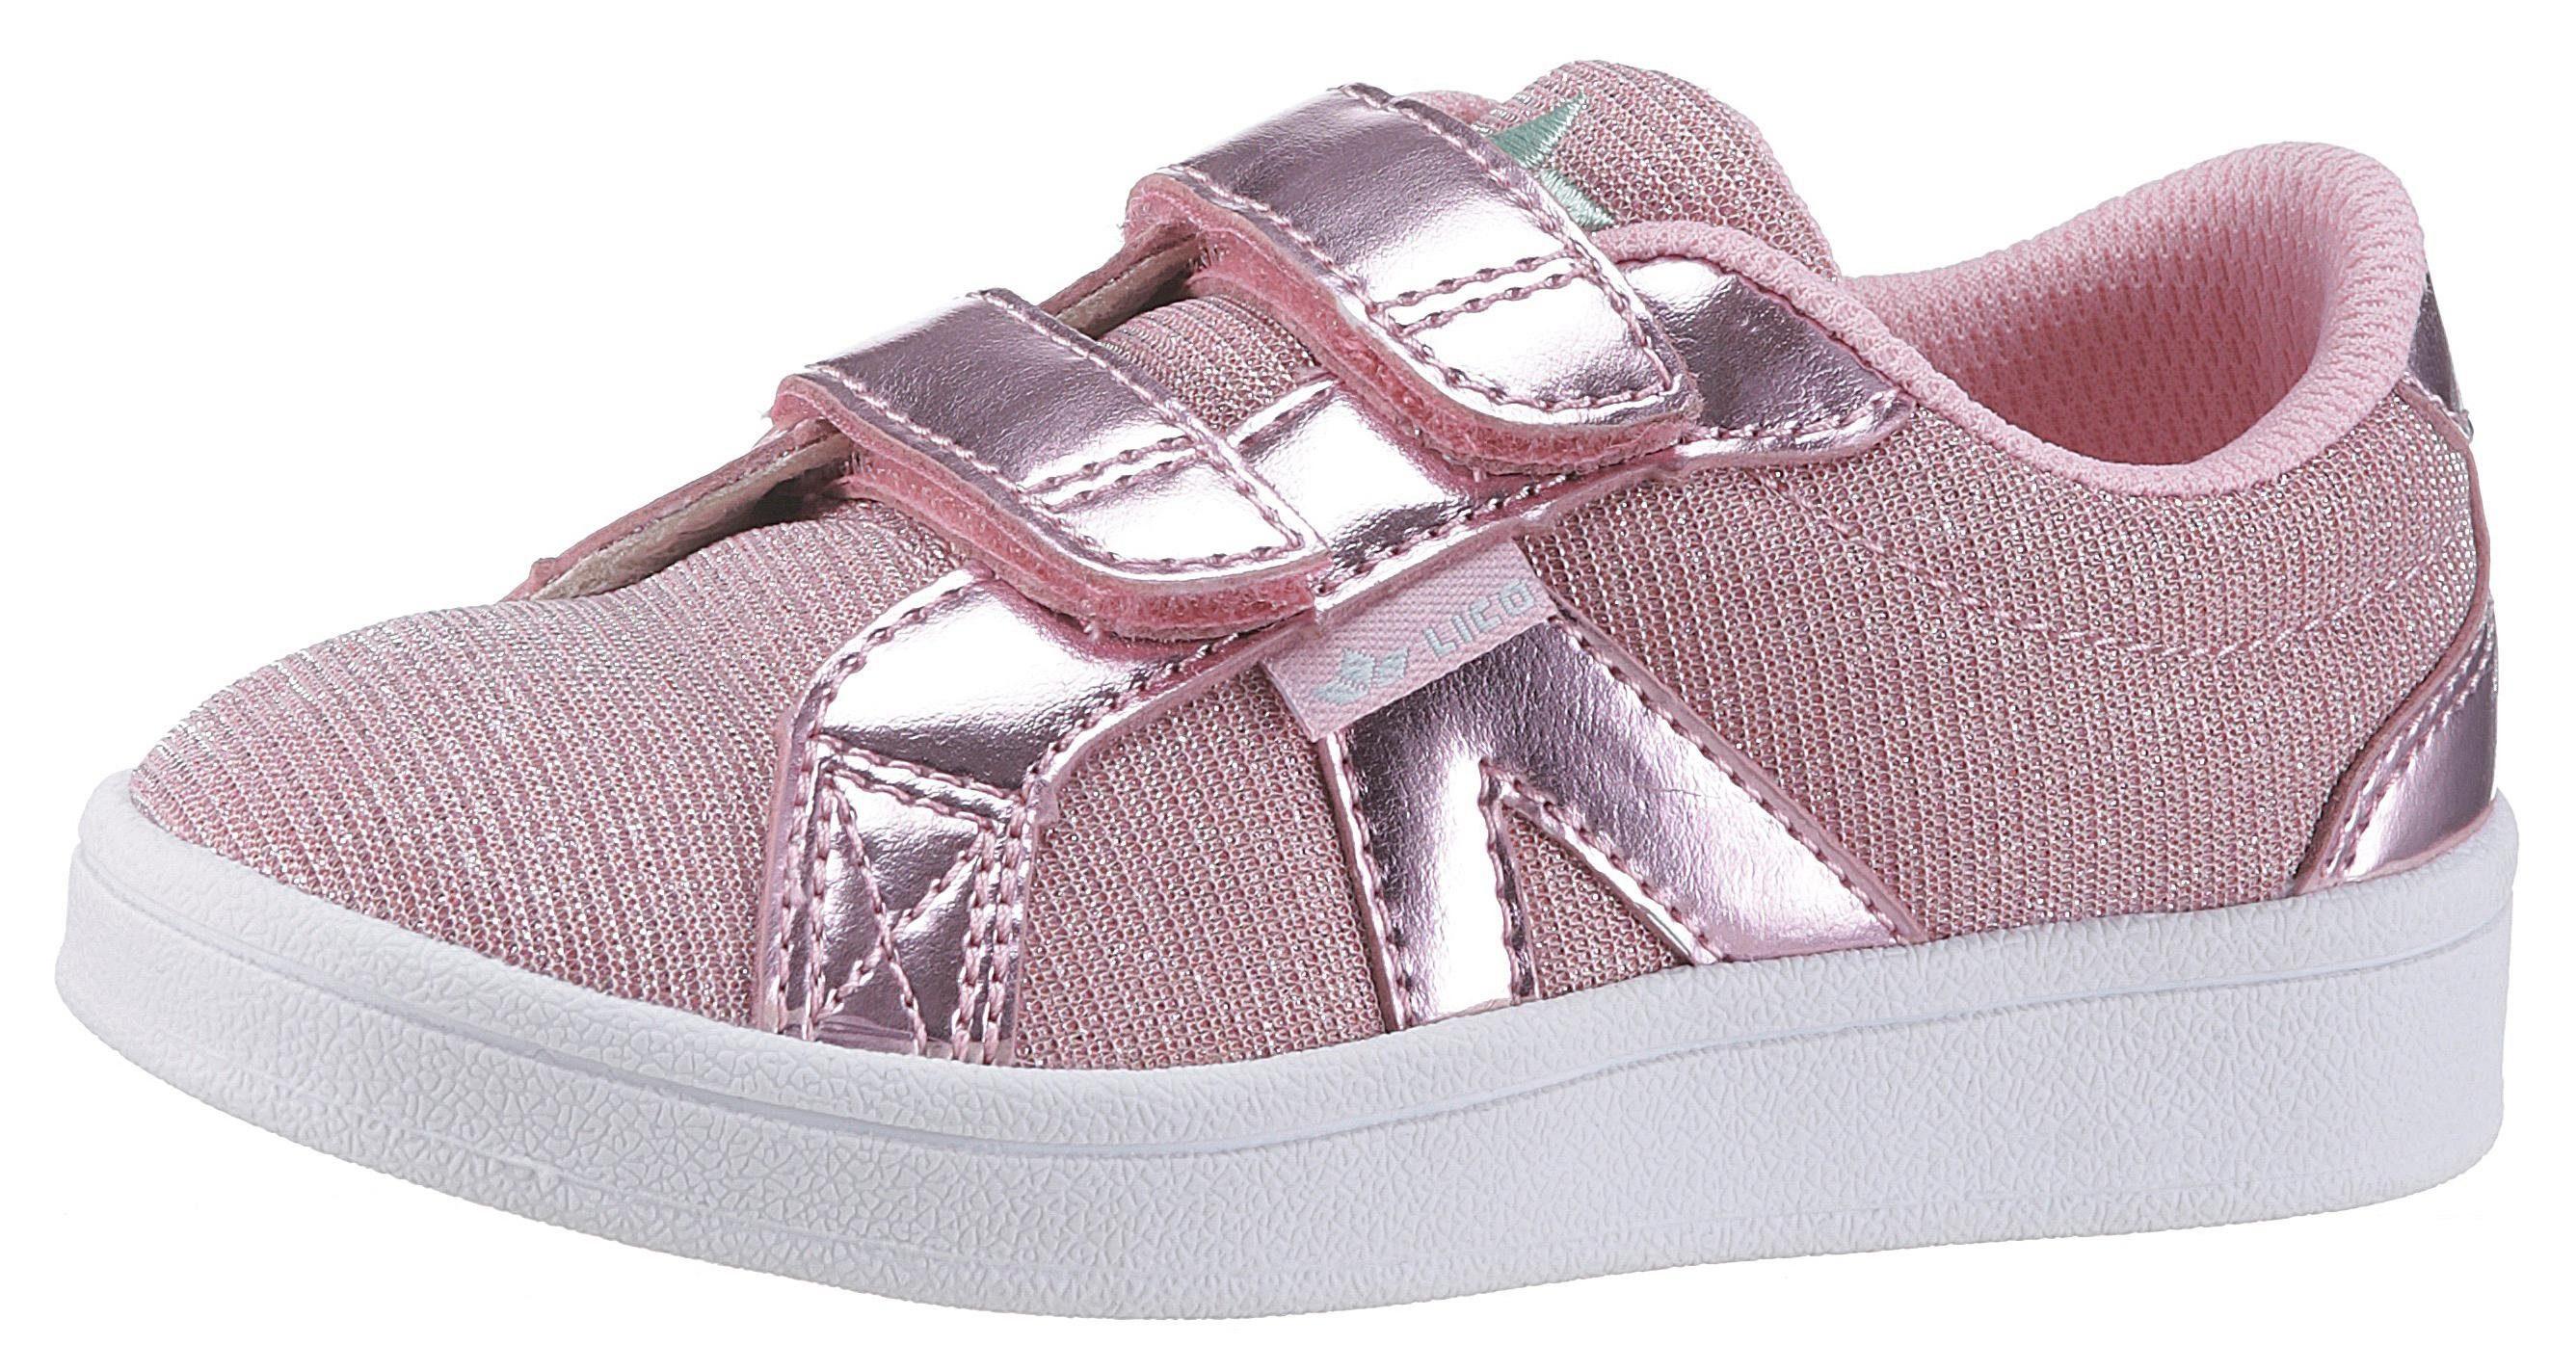 Lico »Frances V« Sneaker mit glitzerndem Mesh